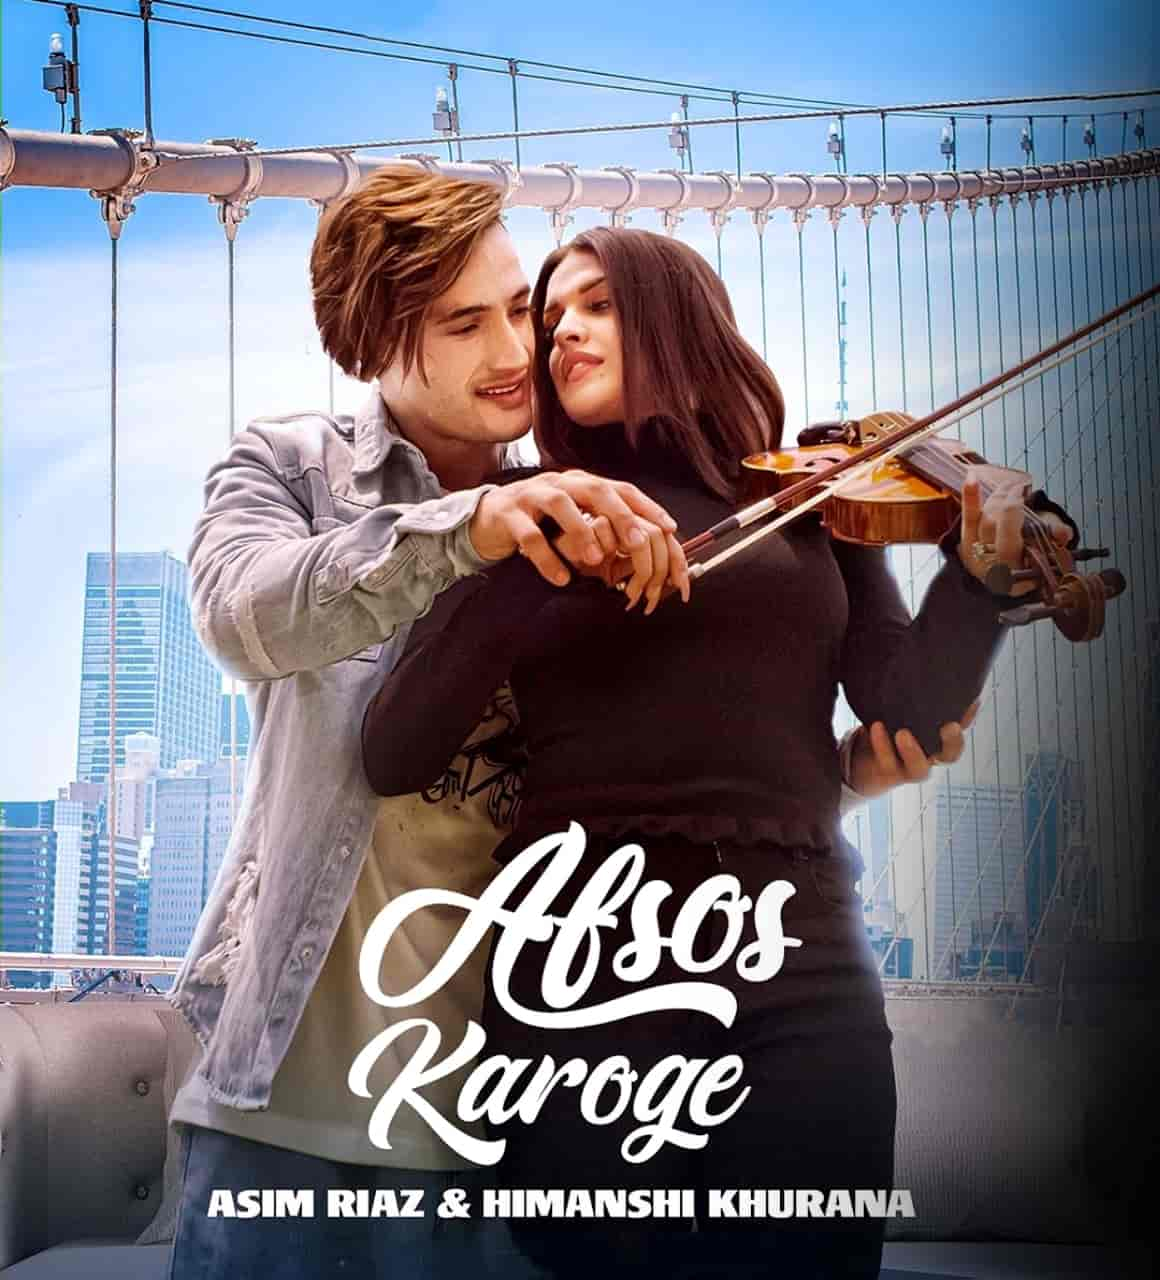 Afsos Karoge Hindi Love Song Image Features Asim Riaz and Himanshi Khurana sung by Stebin Ben